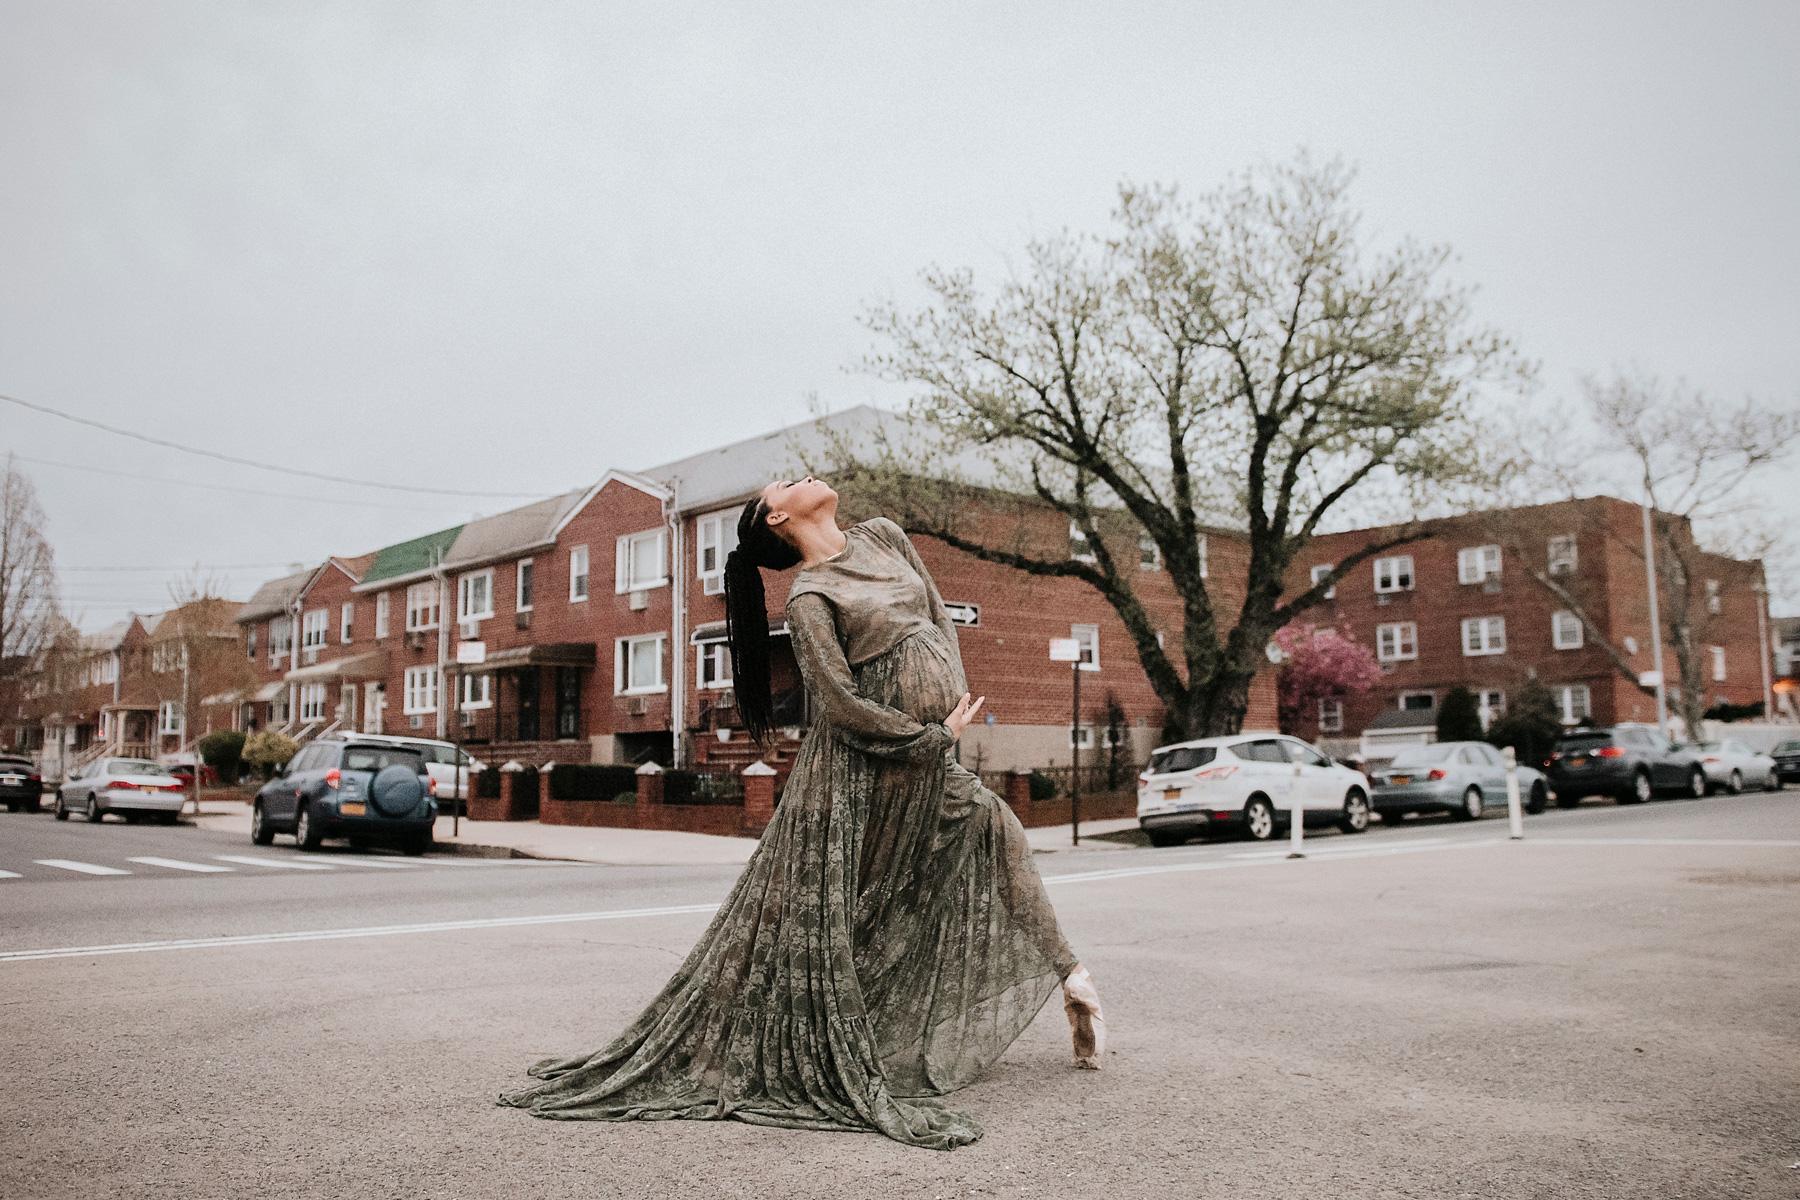 otographer, Babymoon Photographer, Travel Photographer, Destination Photographer, Luxury Maternity Photographer, NYC Maternity Photographer, Brooklyn Maternity Photographer, PRegnancy Dancer Photo Shoot